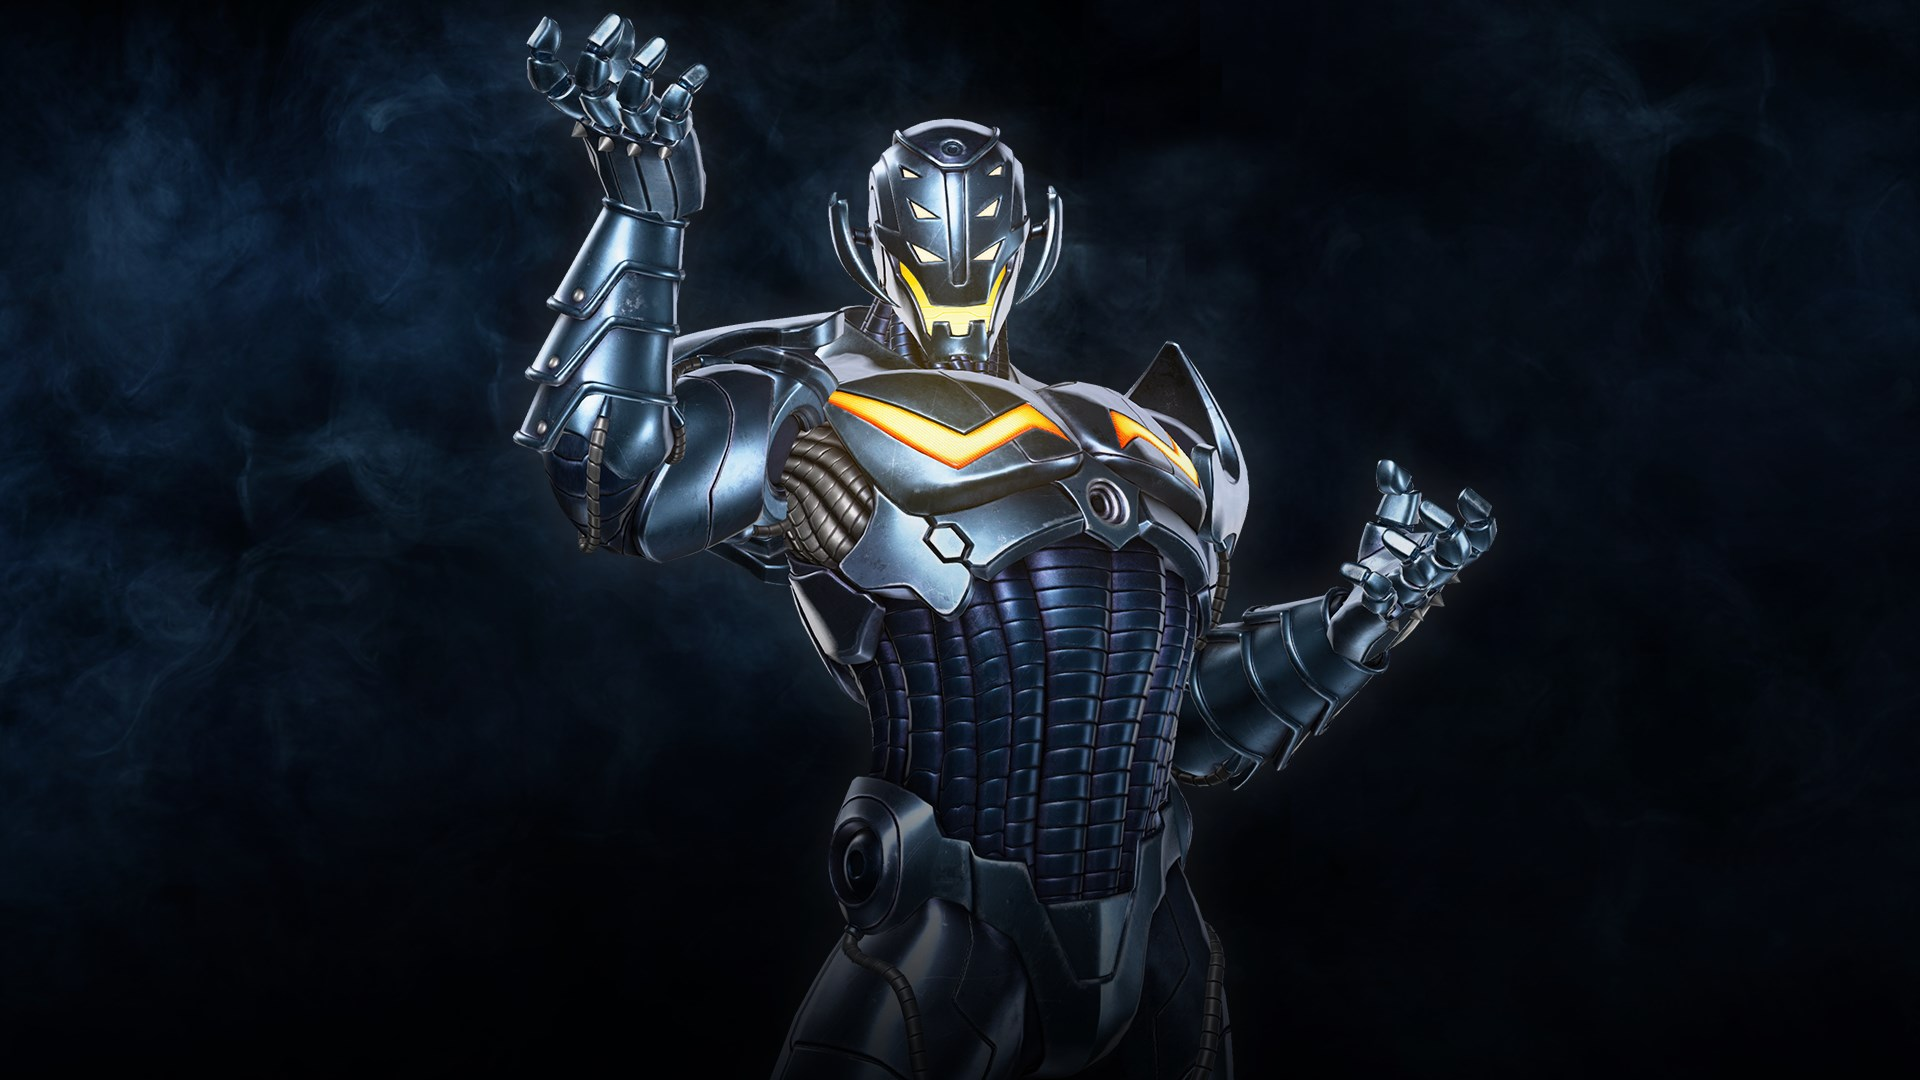 Marvel vs. Capcom: Infinite - Ultron Conquest Costume